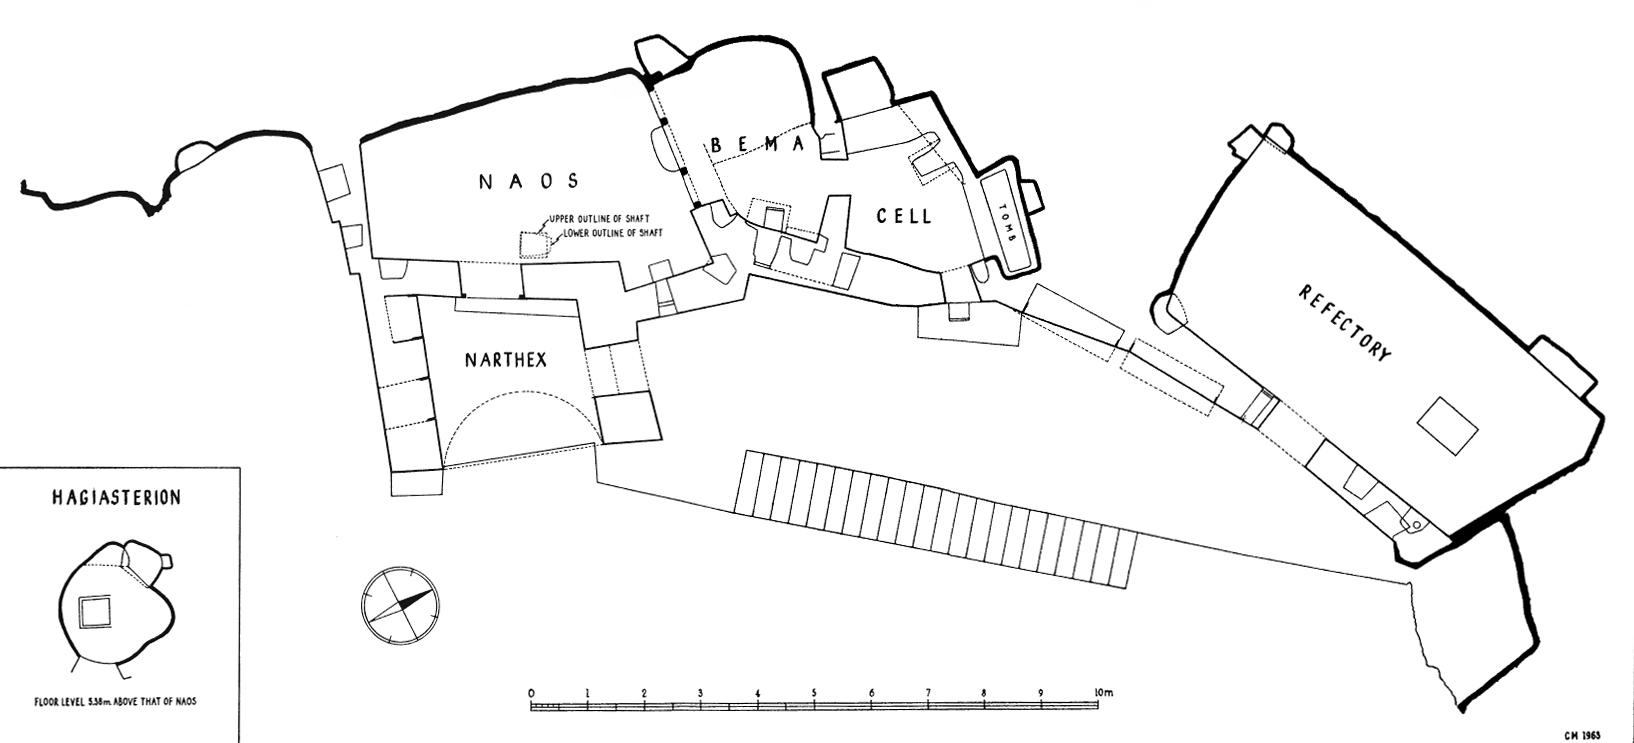 Fig. 1: Plan of the Enkleistra complex of St. Neophytos (Kakoulli and Fischer 2008–2009)